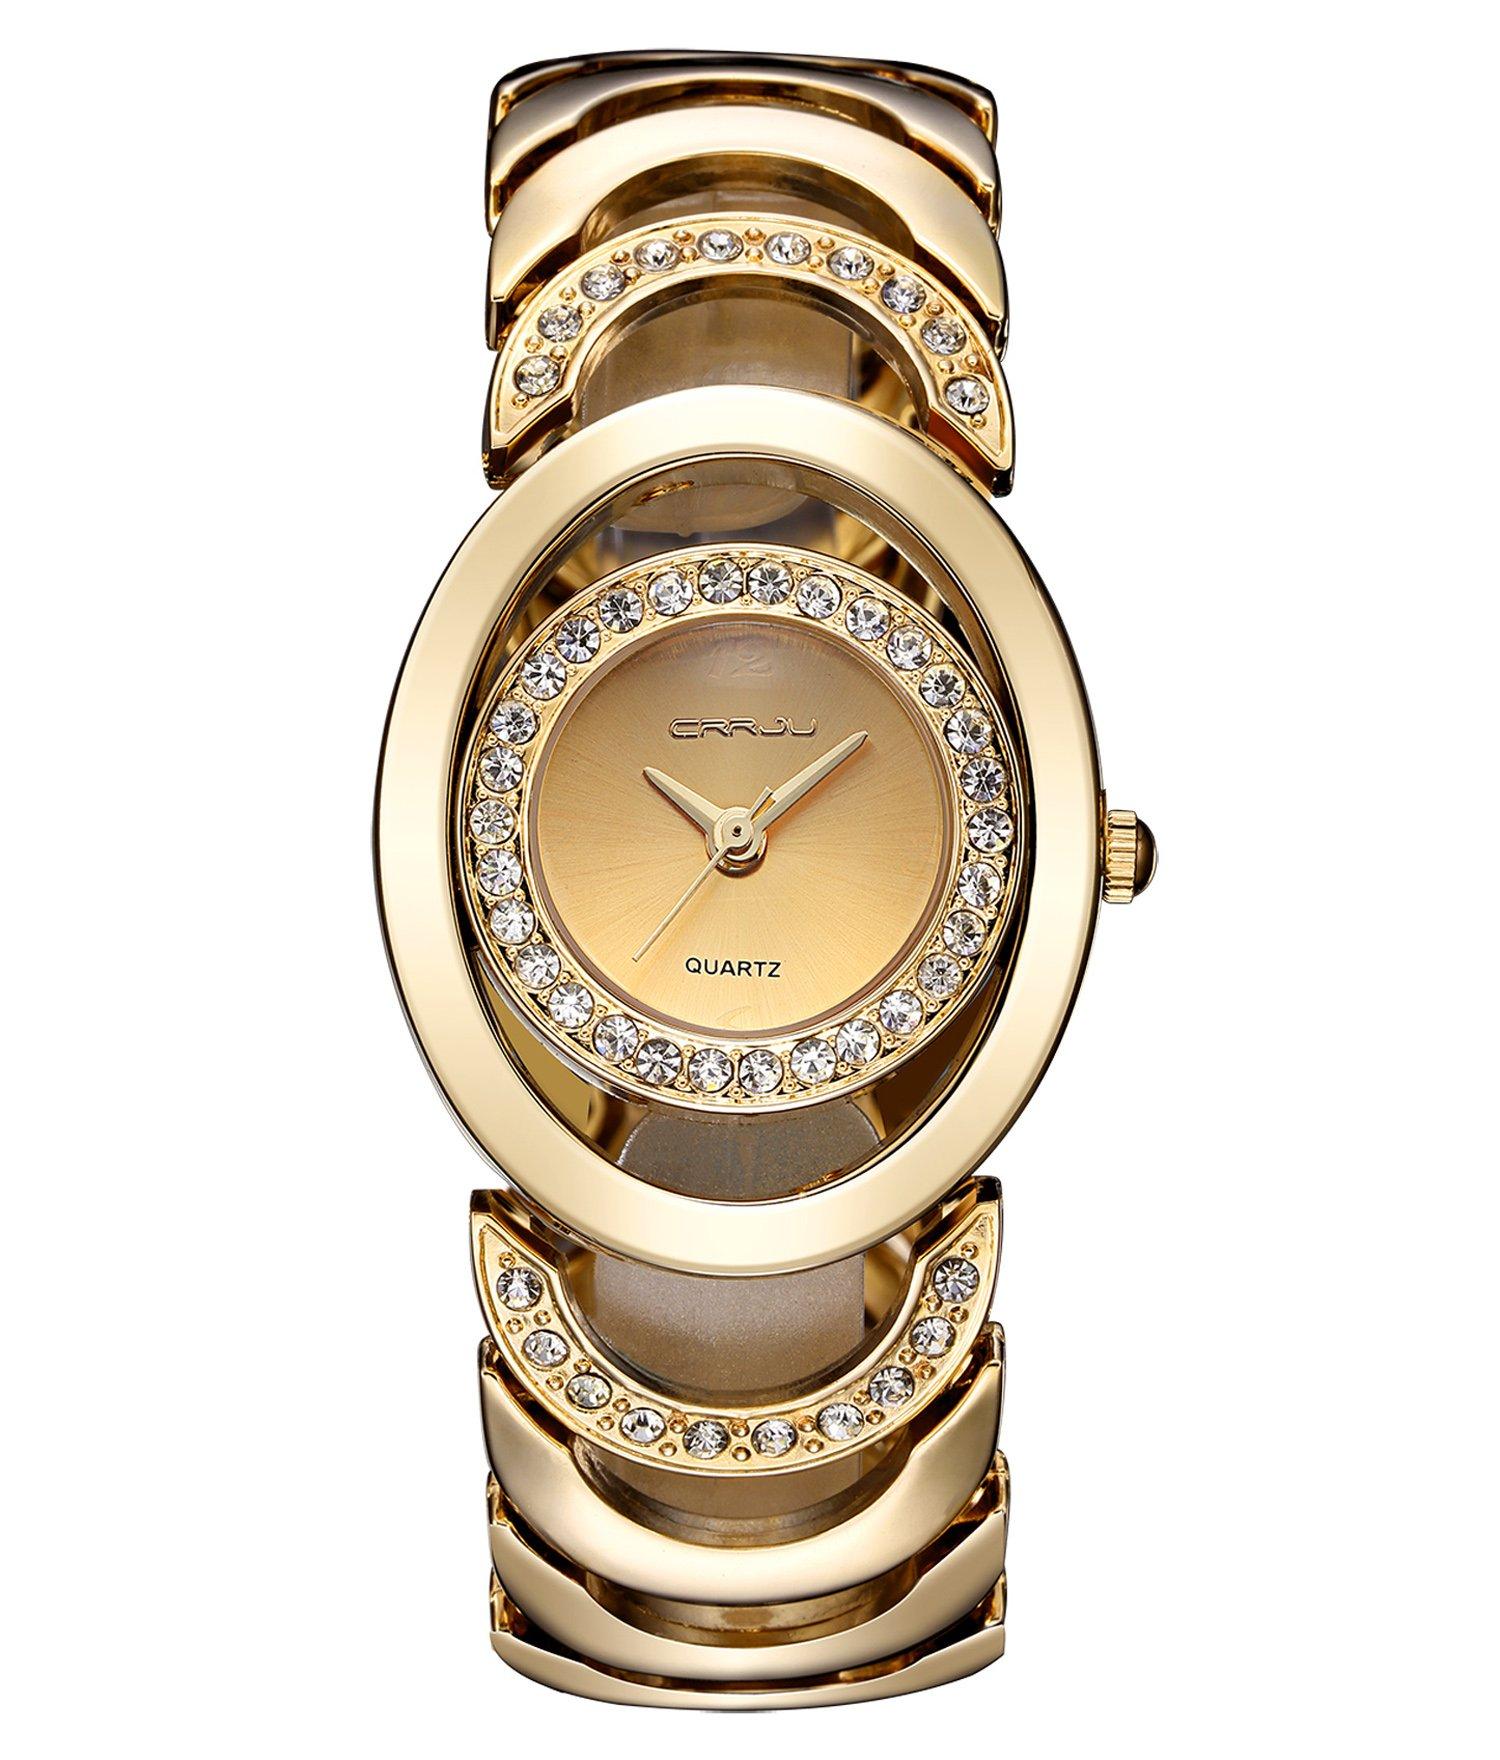 Timewheel Luxury Rhinestone Quartz Watches for Women Gold Stainless Steel Waterproof Bracelet Wristwatch